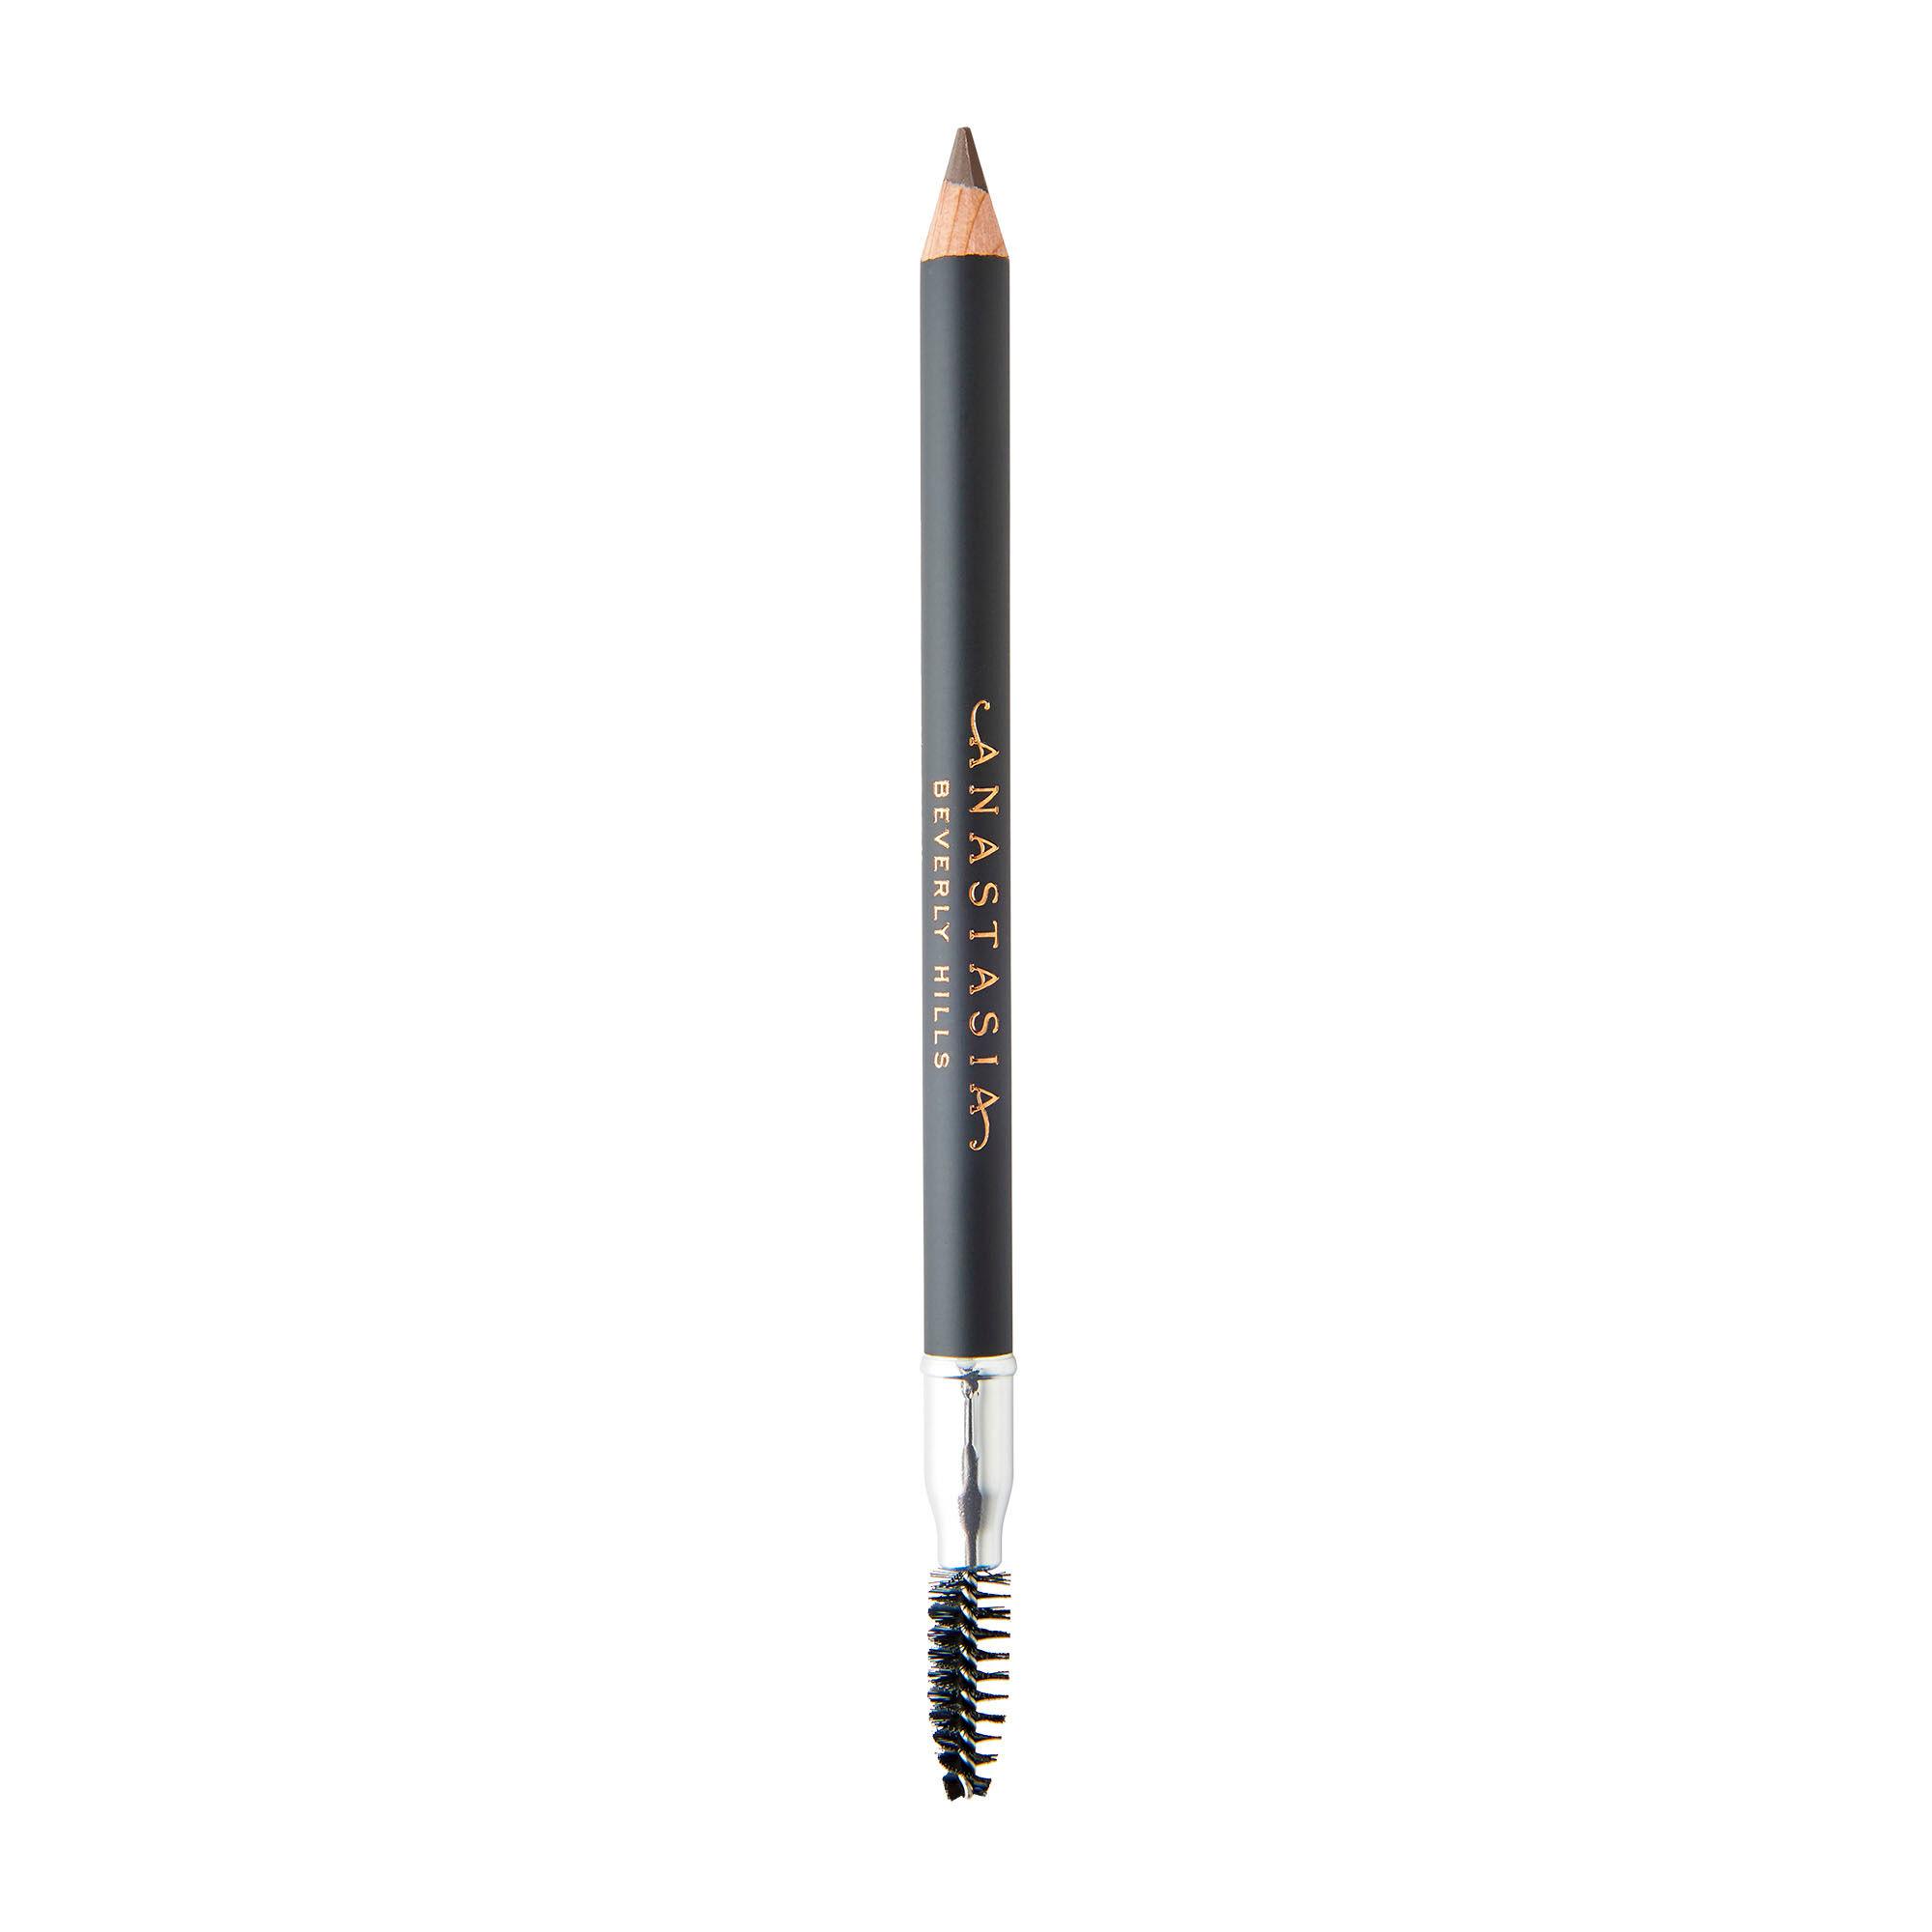 Anastasia Beverly Hills Crayon Perfect Brow Pencil Auburn Medium Brown 1.05g